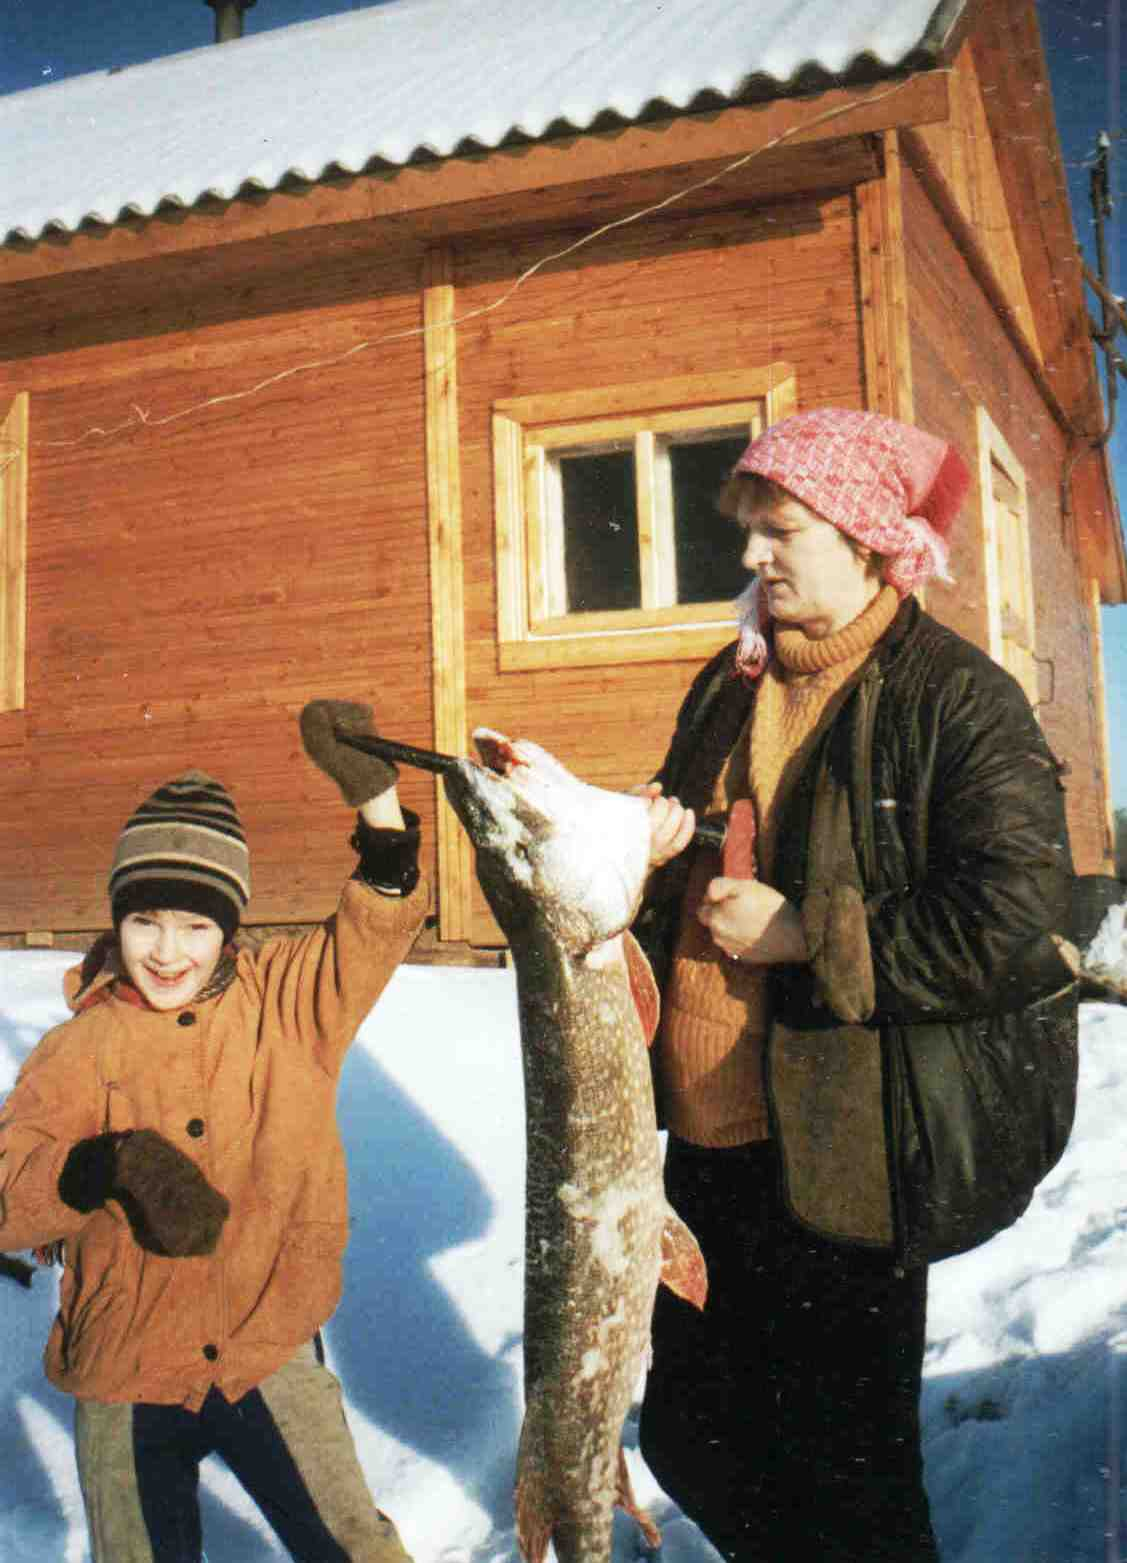 1996, д. Берег, Доника (Белая) Галина Васильевна, щука 9 кг, поймана на Вычегде.